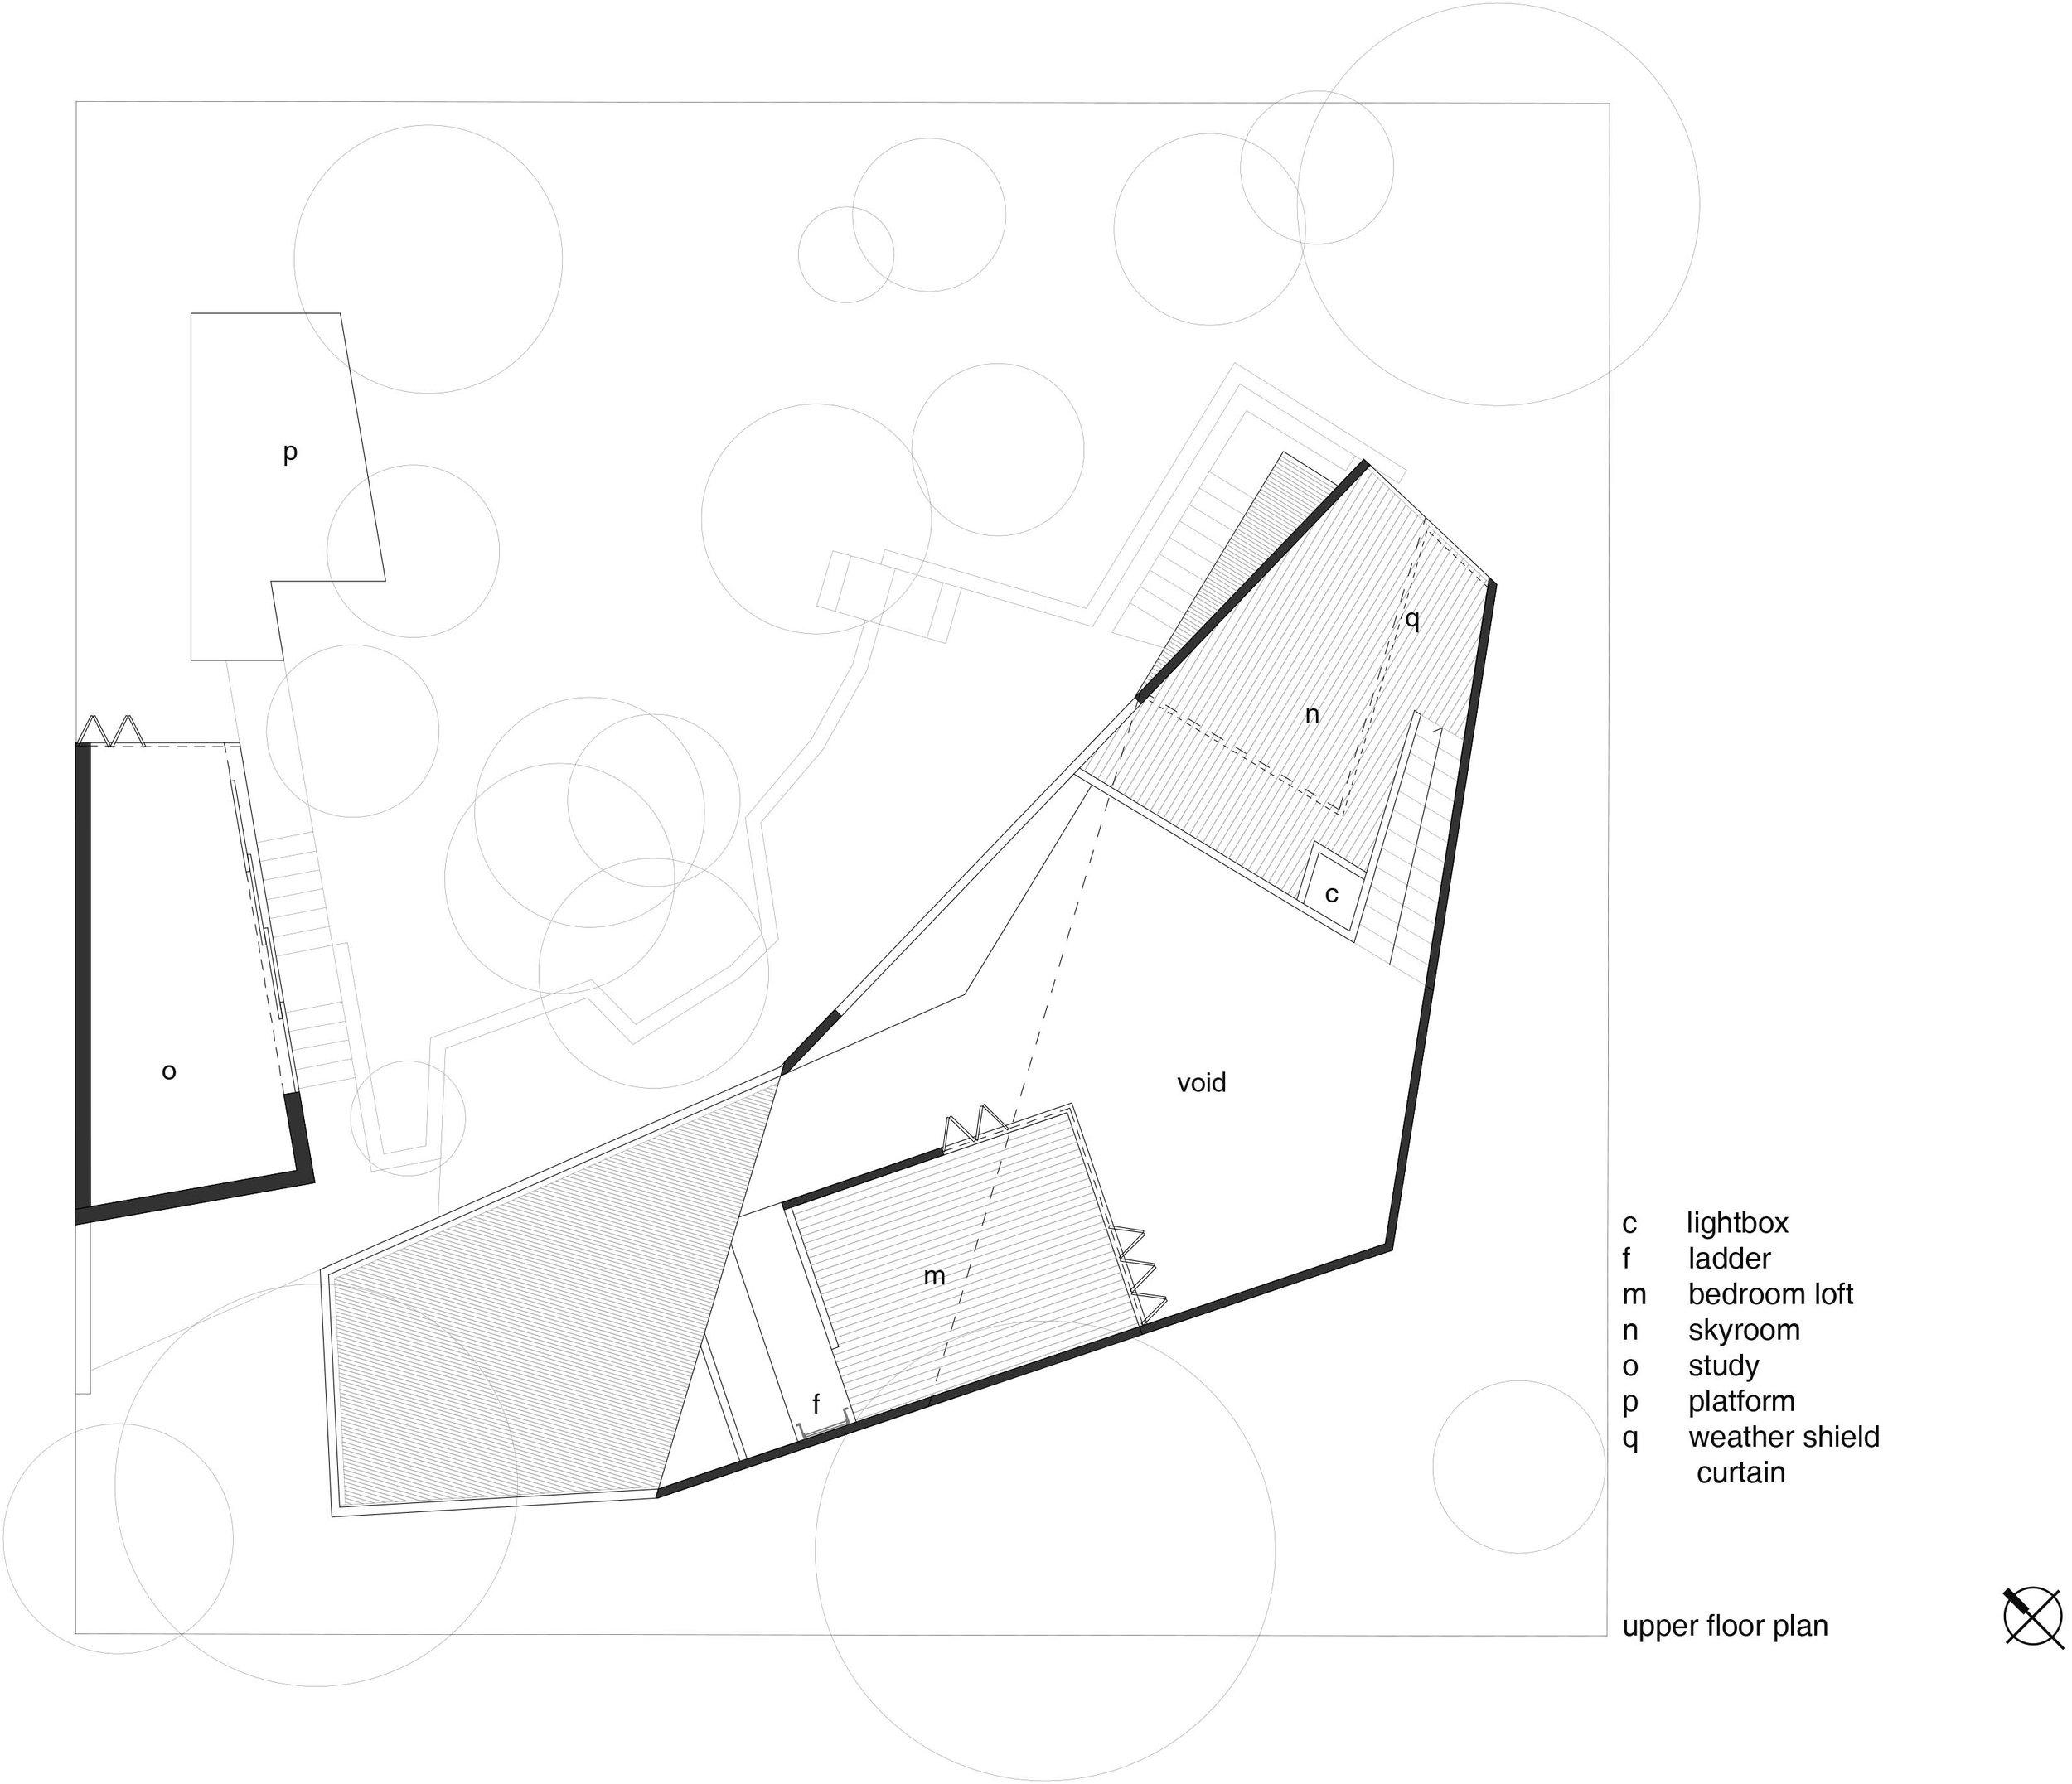 phorm-proposal-upper plan label.jpg